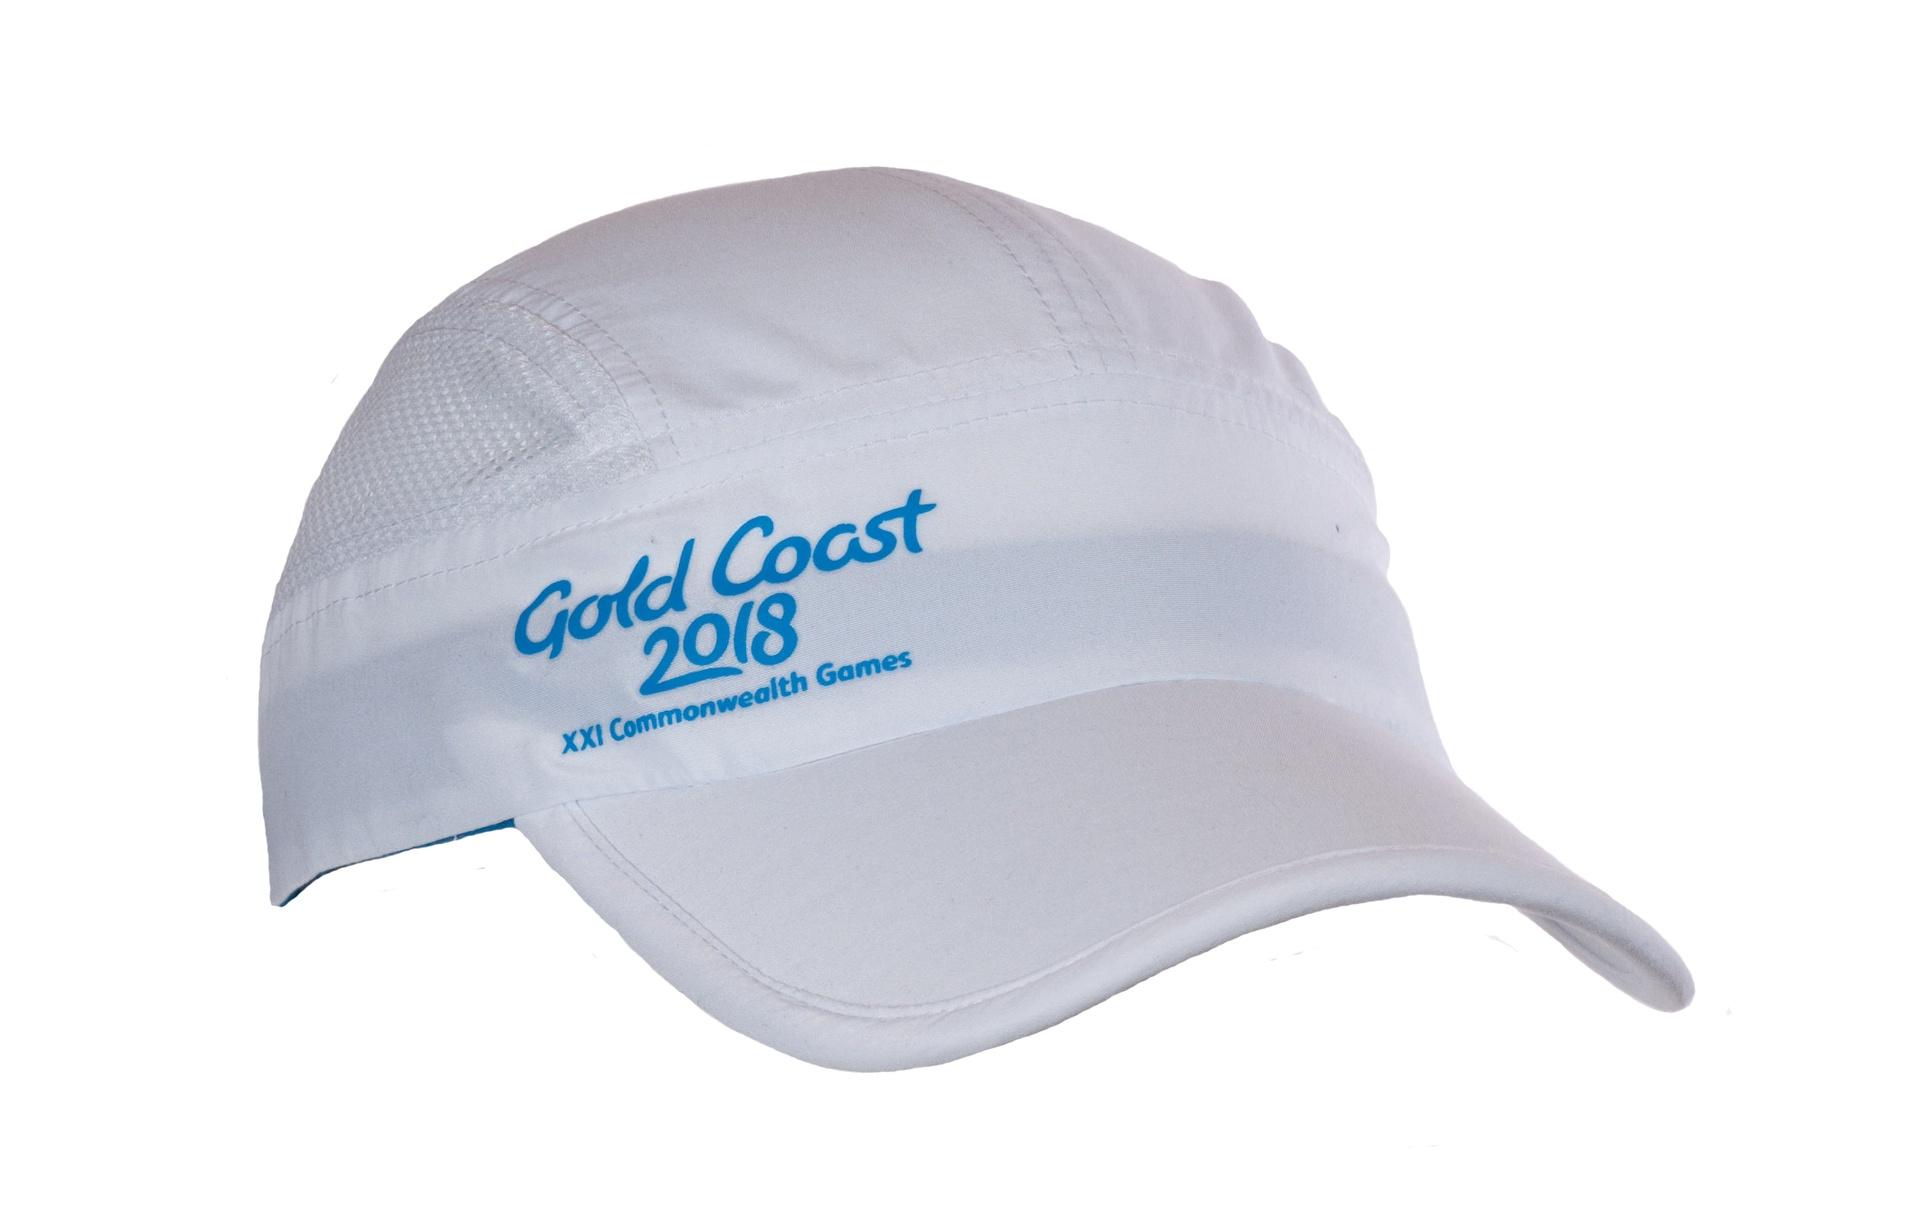 Gold Coast 2018 Tech Cap White Image